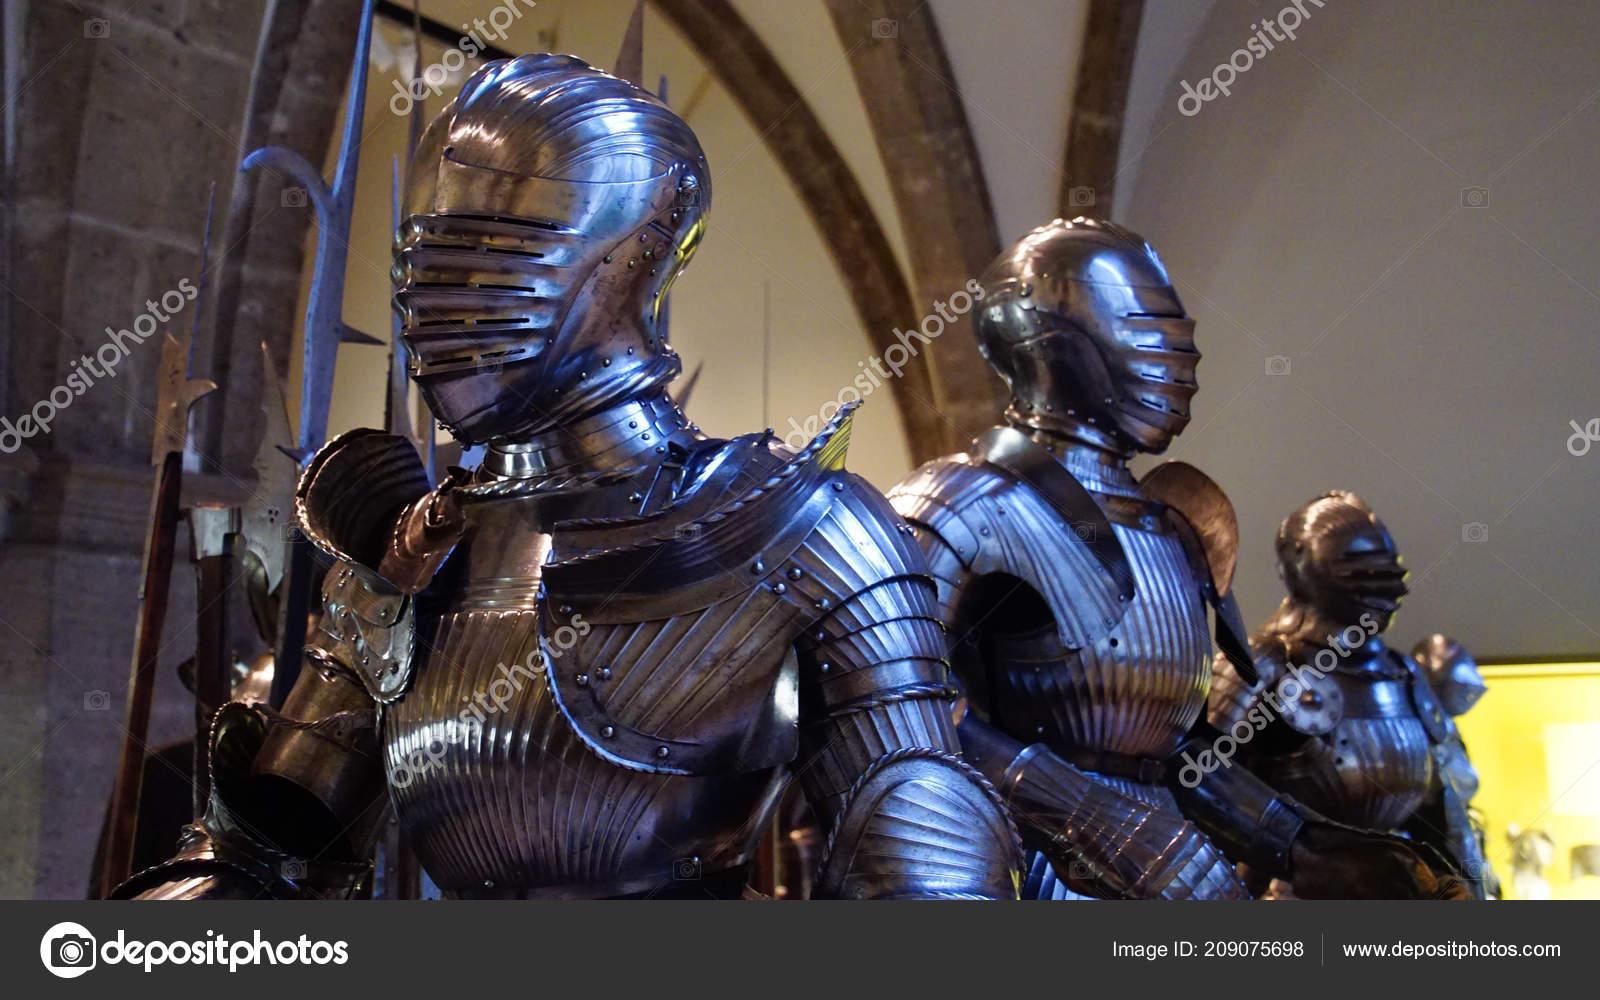 munich jul 2018 medieval knight suit armor bavarian national museum